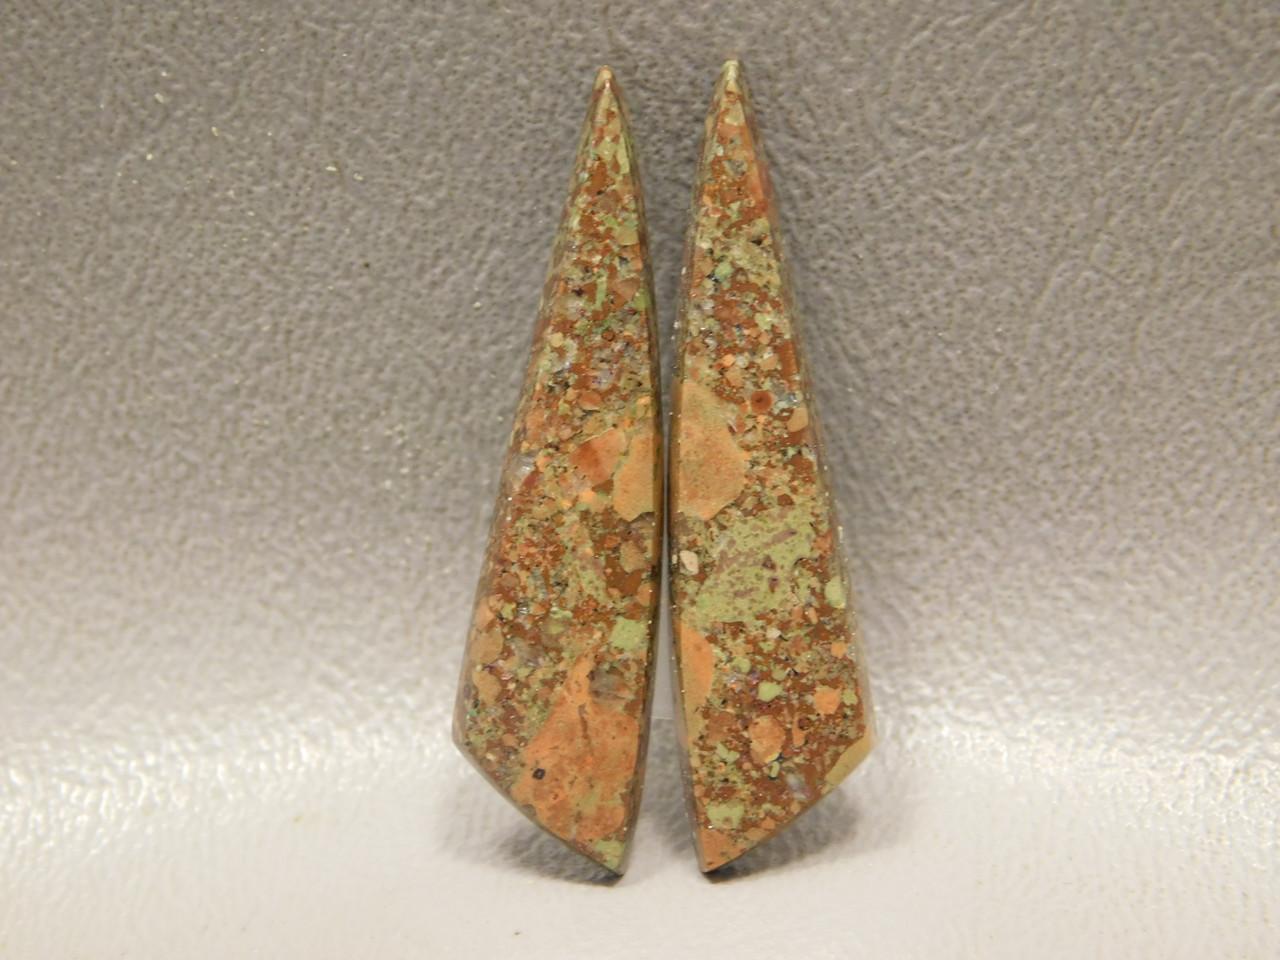 Copper Rose Semi Precious Gemstone Matched Pair Cabochons #6